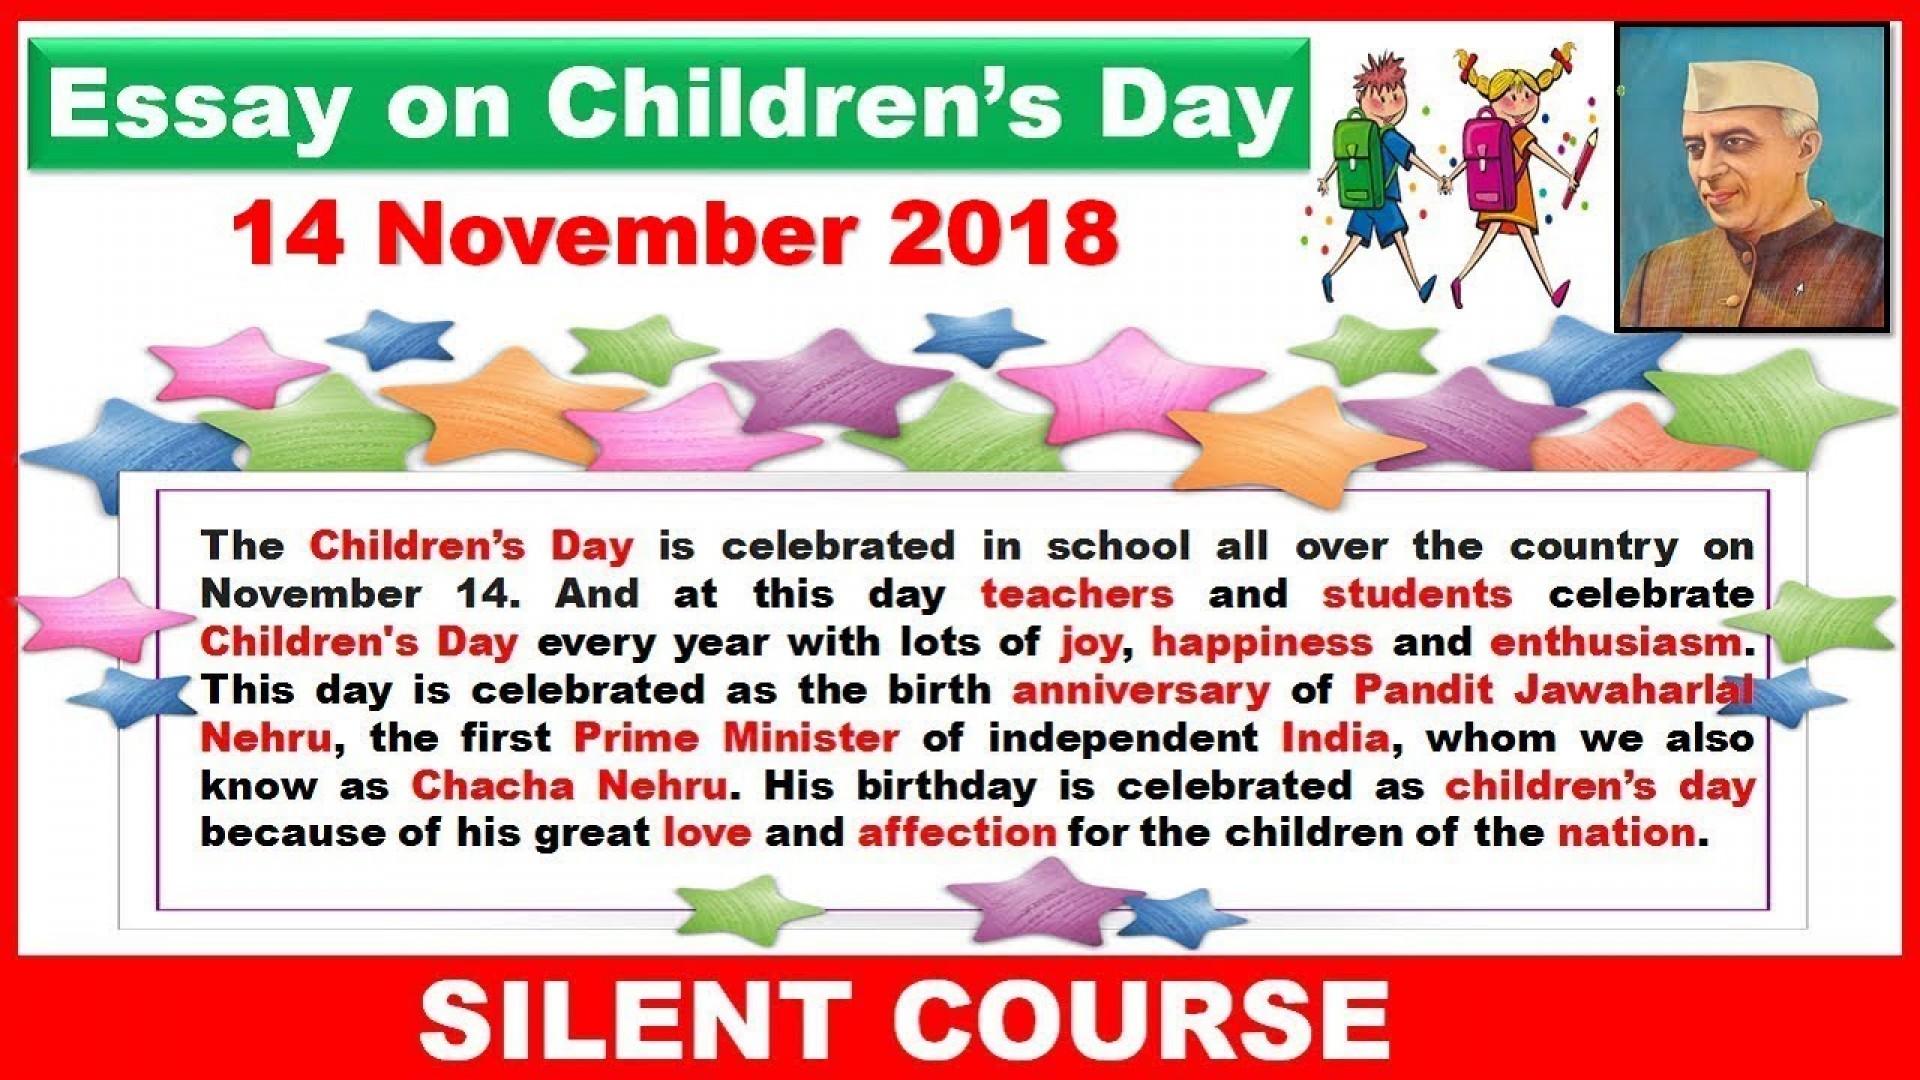 020 Essay Example Maxresdefault On Rare Children Children's Day In Kannada Telugu 1920